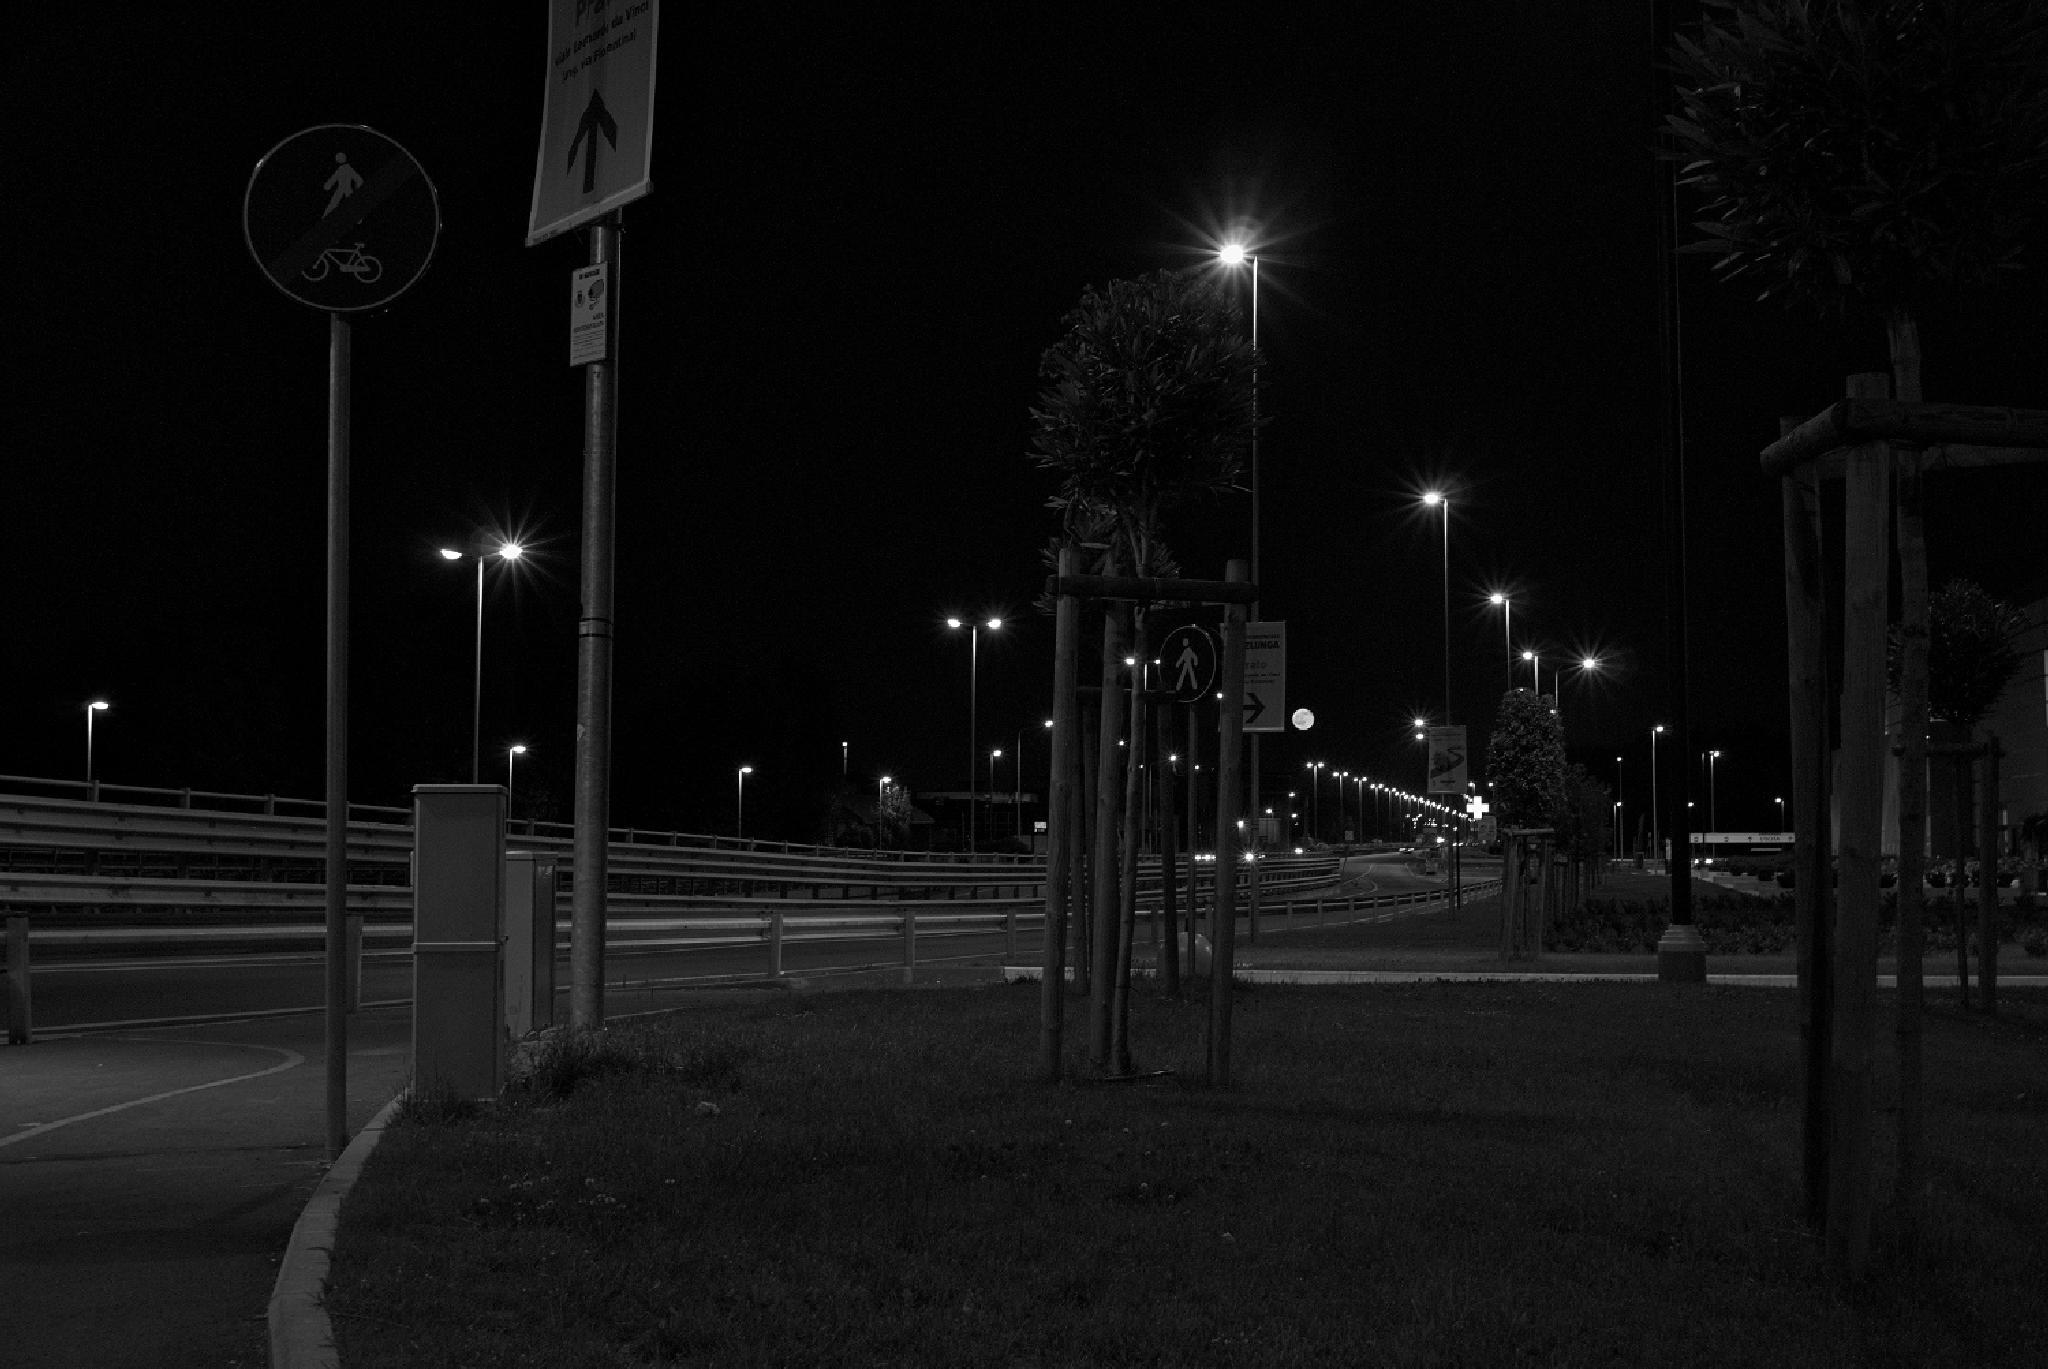 di notte by nevada749